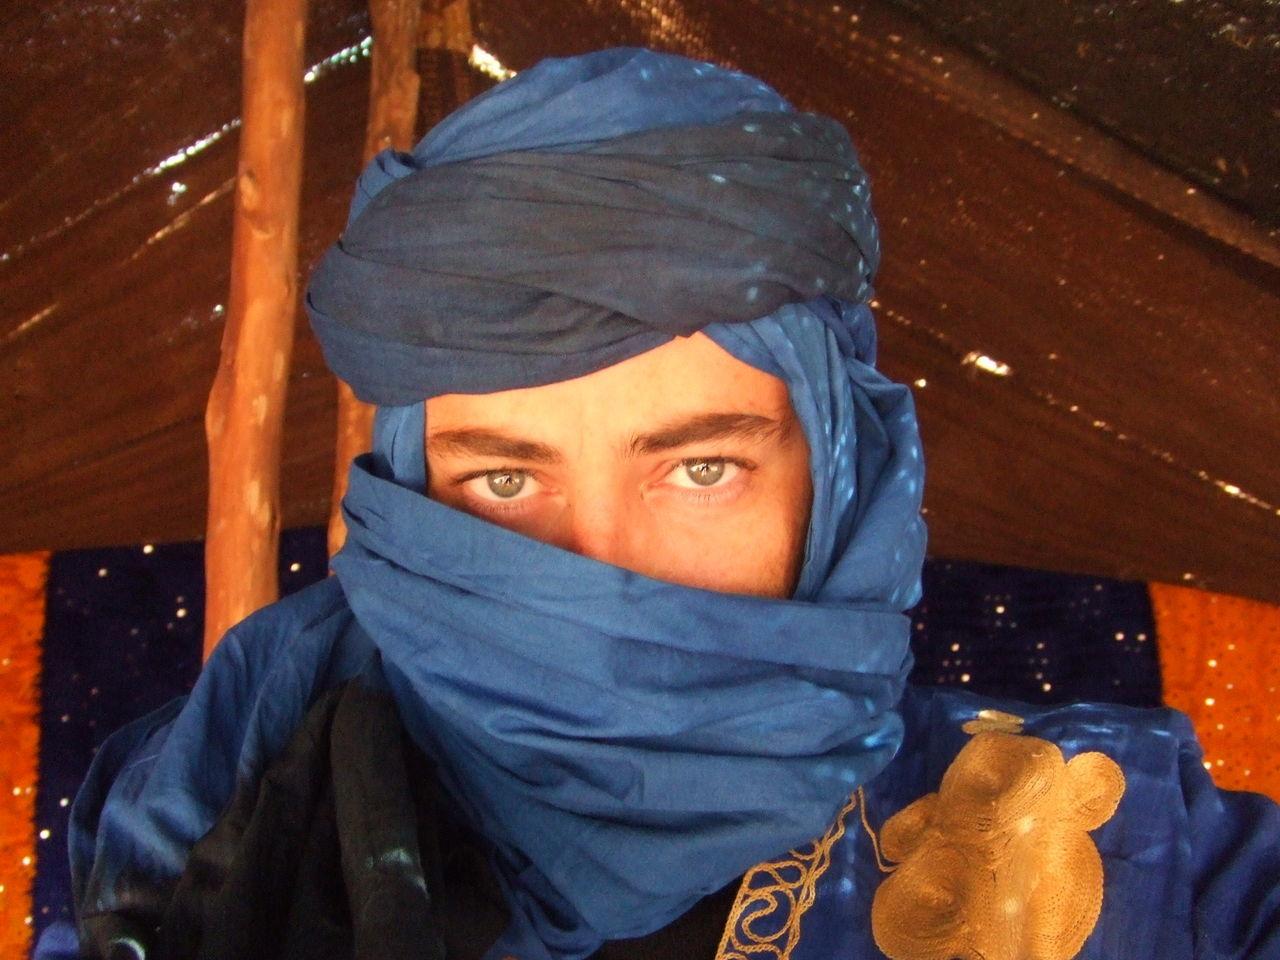 Me Caravan desert Touareg touareg blue Eyes Man Touareg In The Desert Touareg People Touareg Blue Eyesight People Portrait Desert Blue